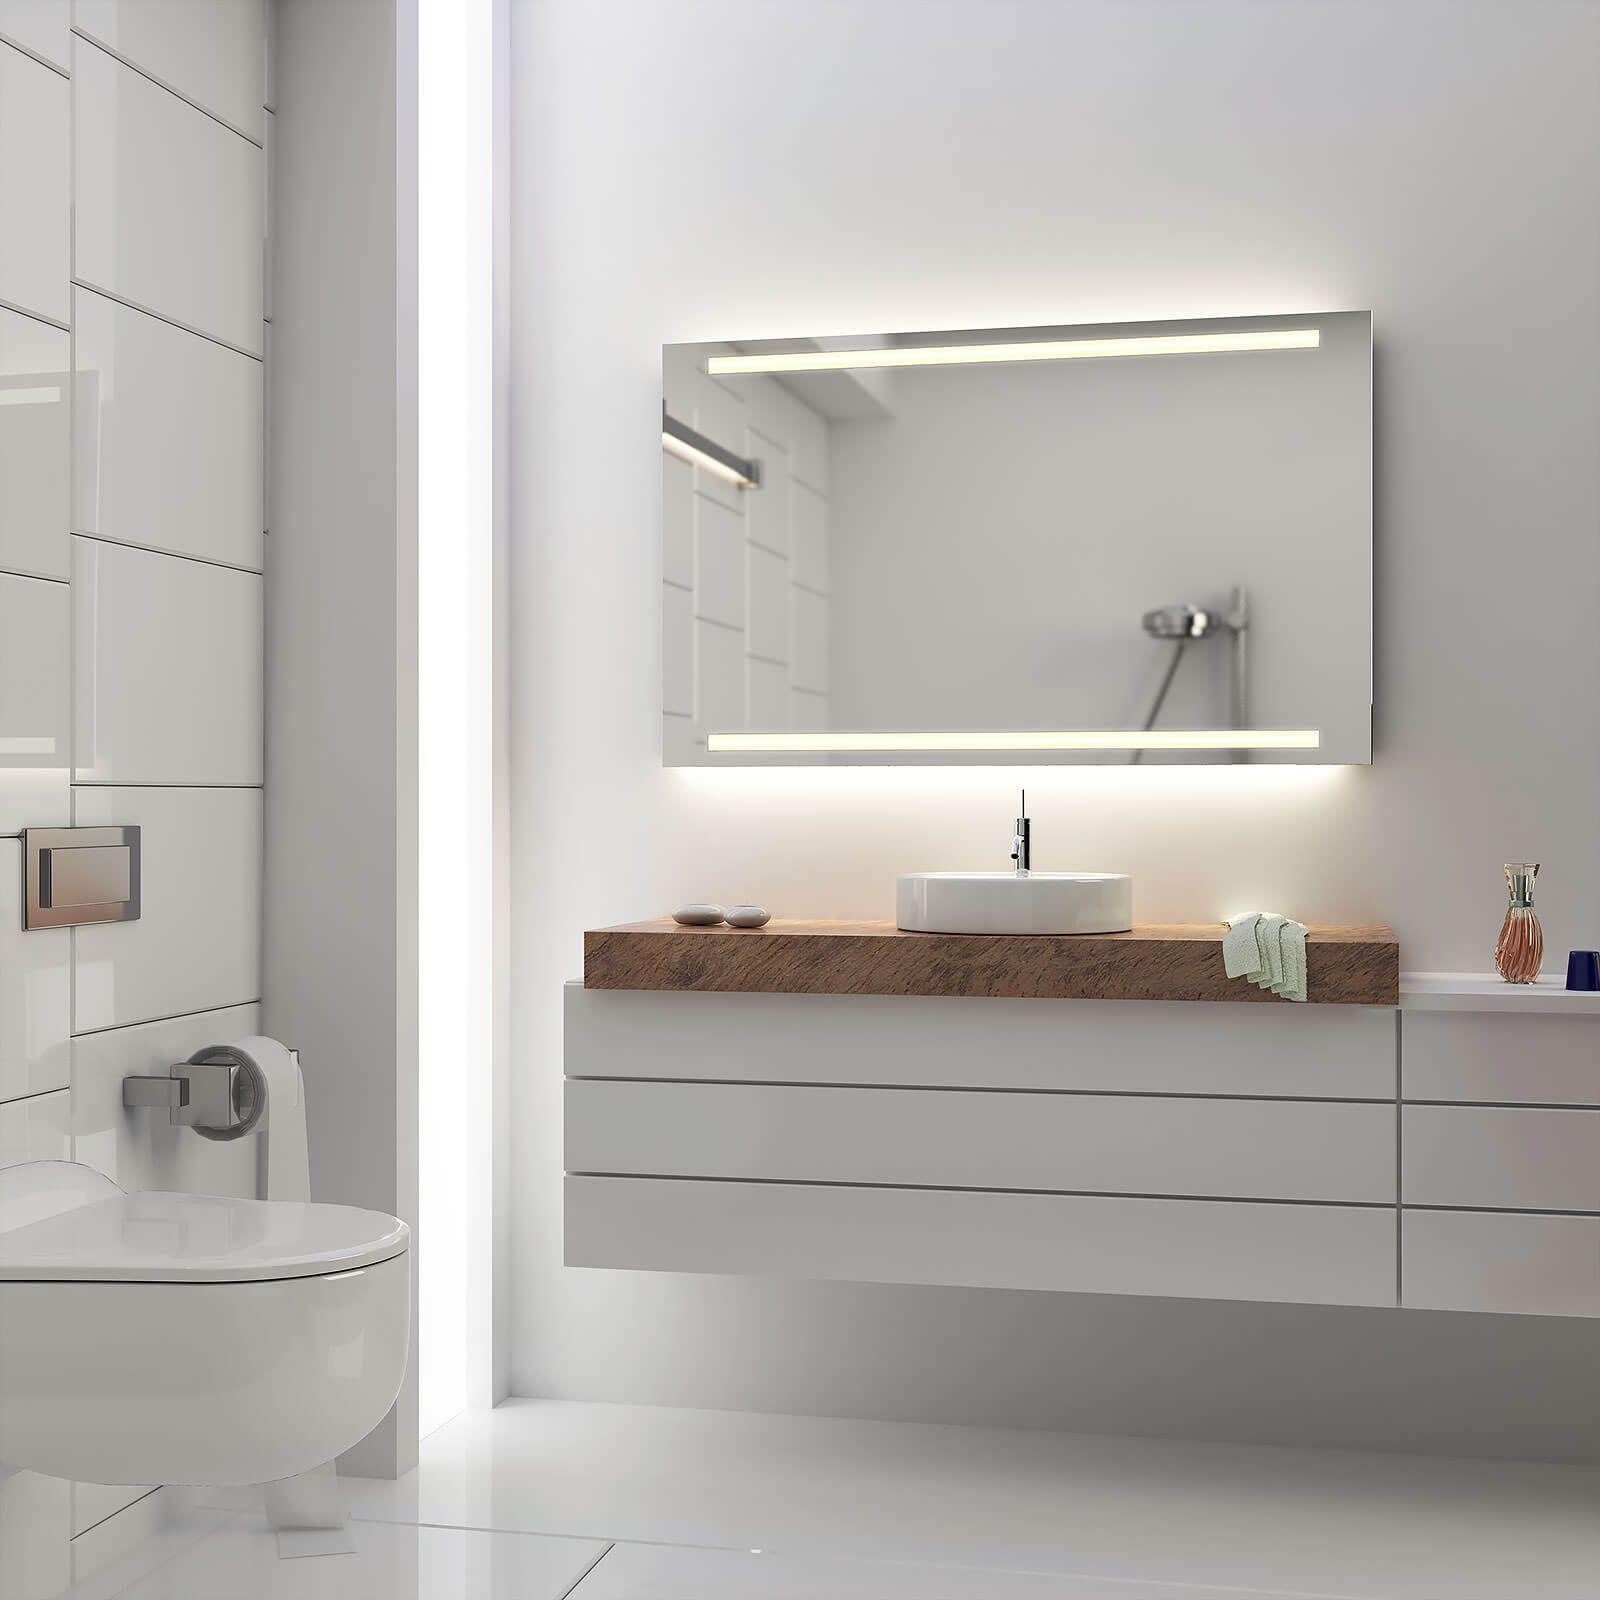 Wandleuchte Badezimmer Badezimmer Led Wandleuchte Bad Spiegel